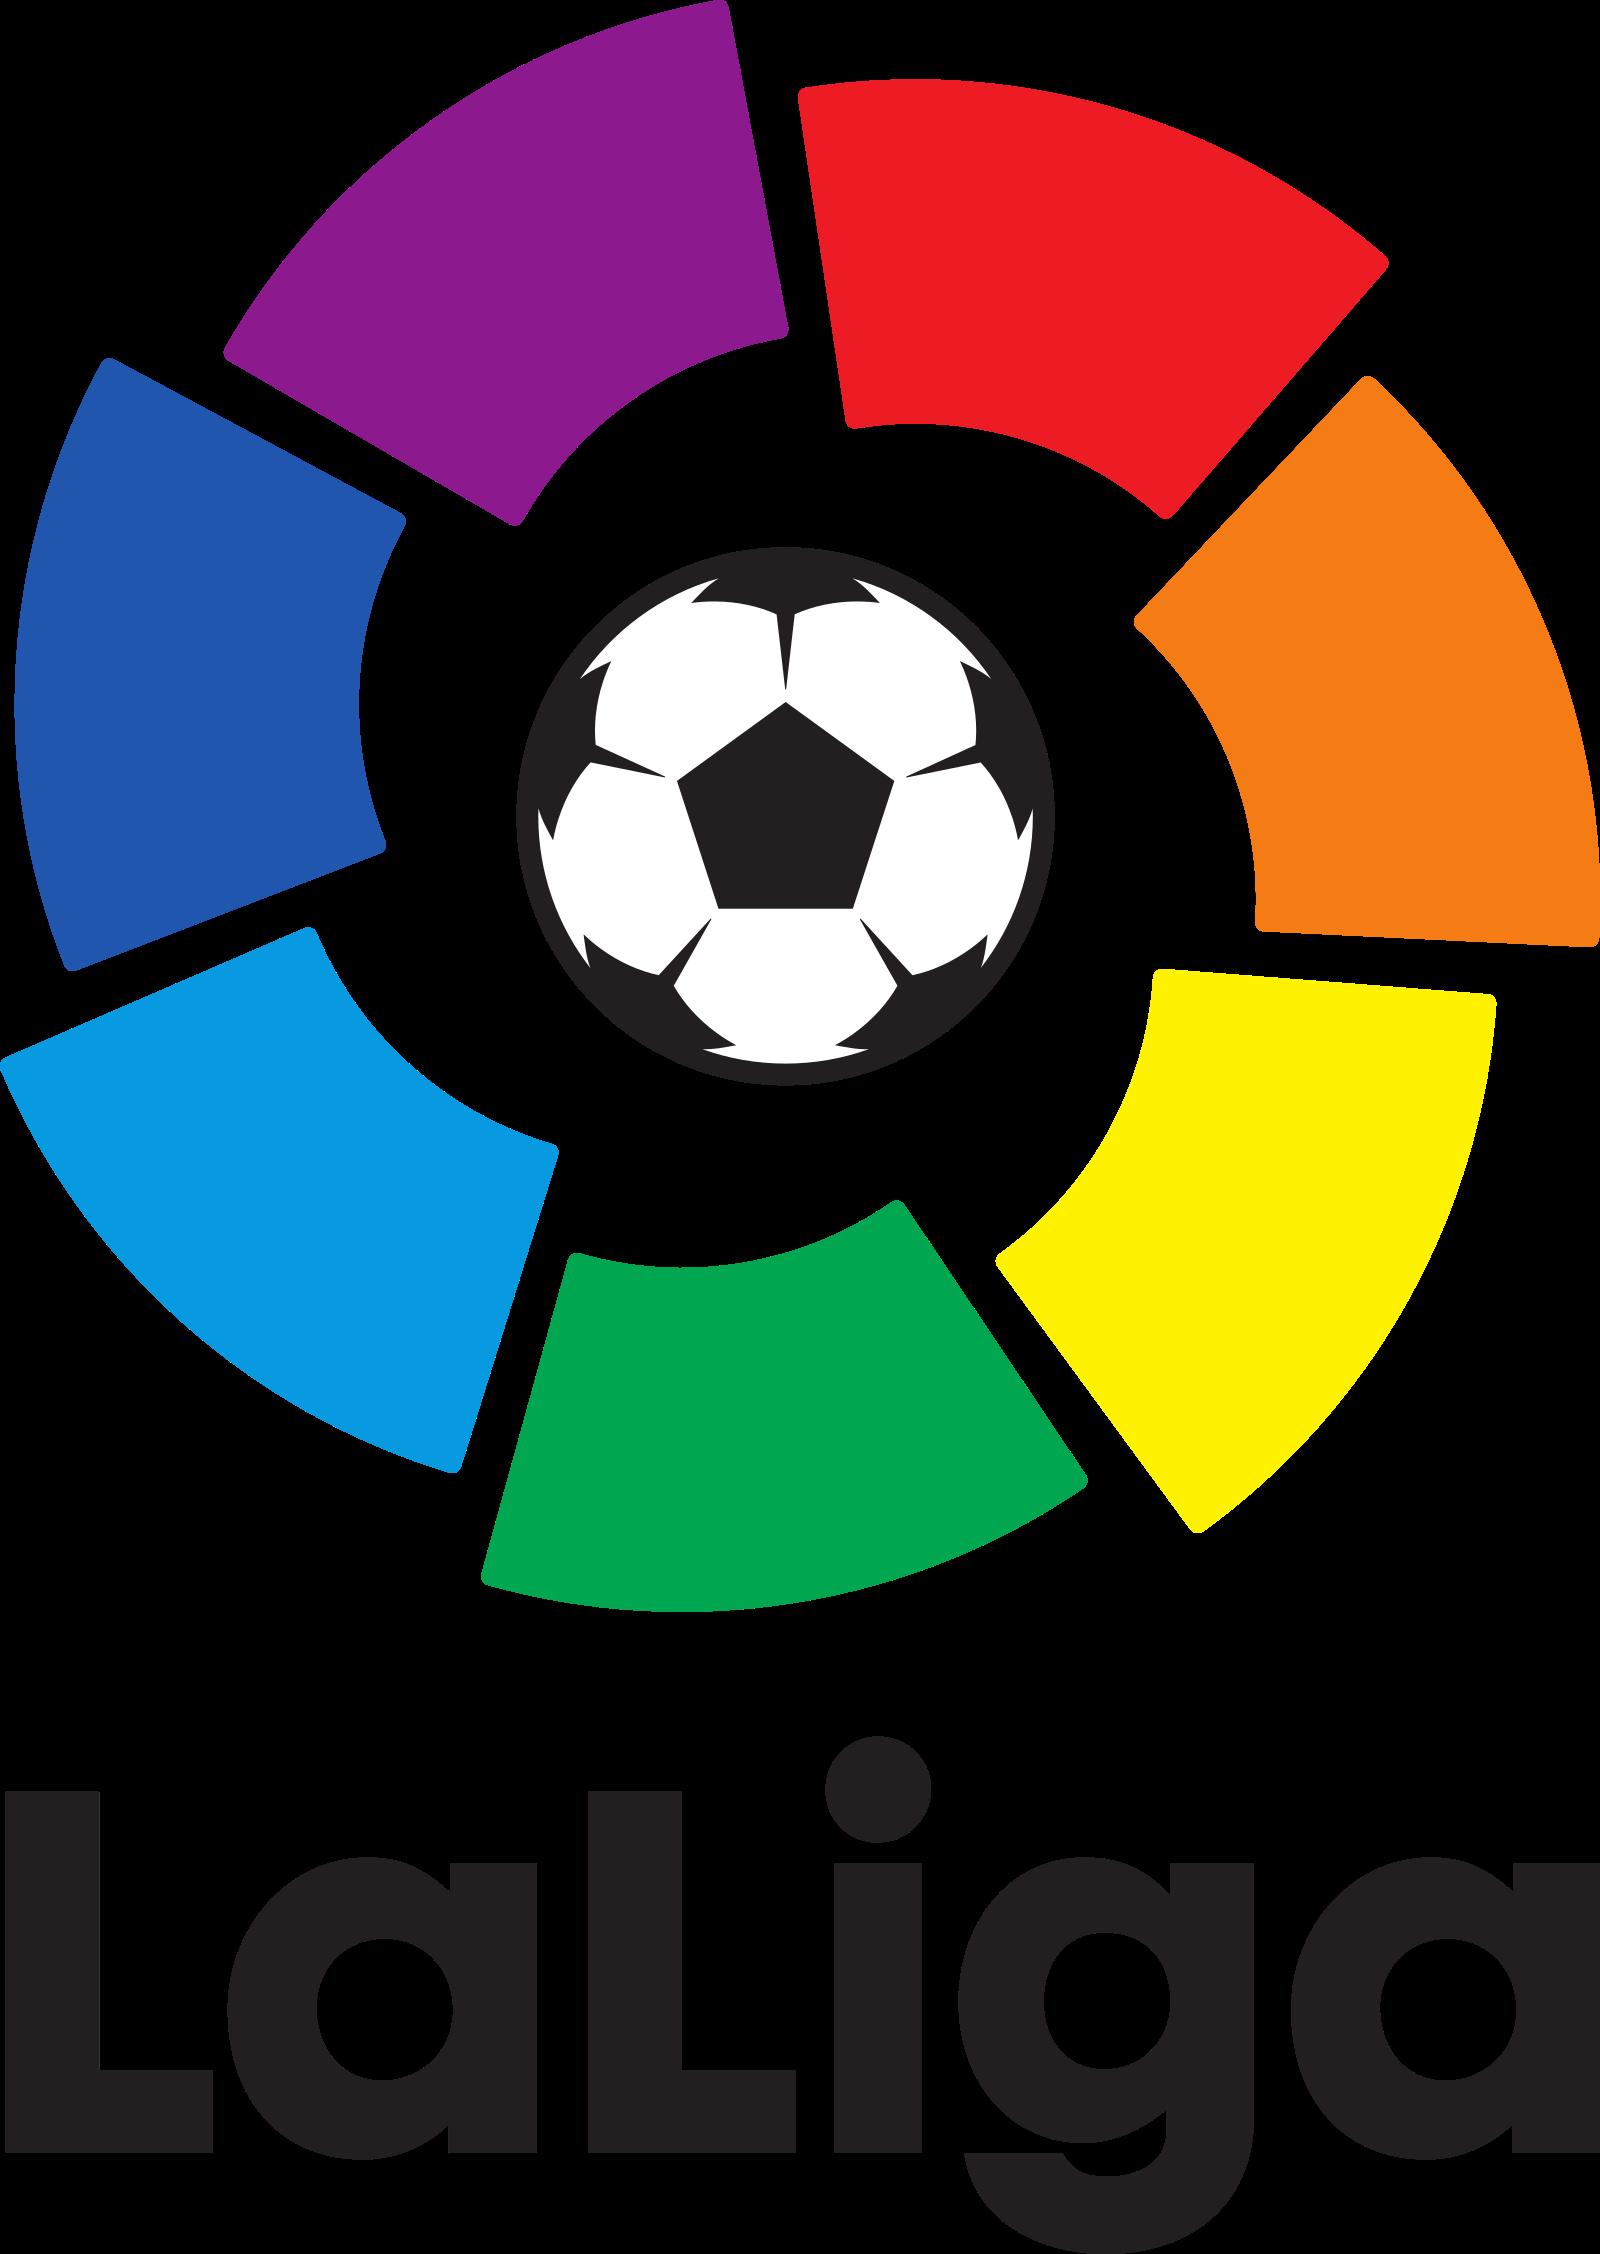 laliga logo 4 - LaLiga Logo – Campeonato Español de Fútbol